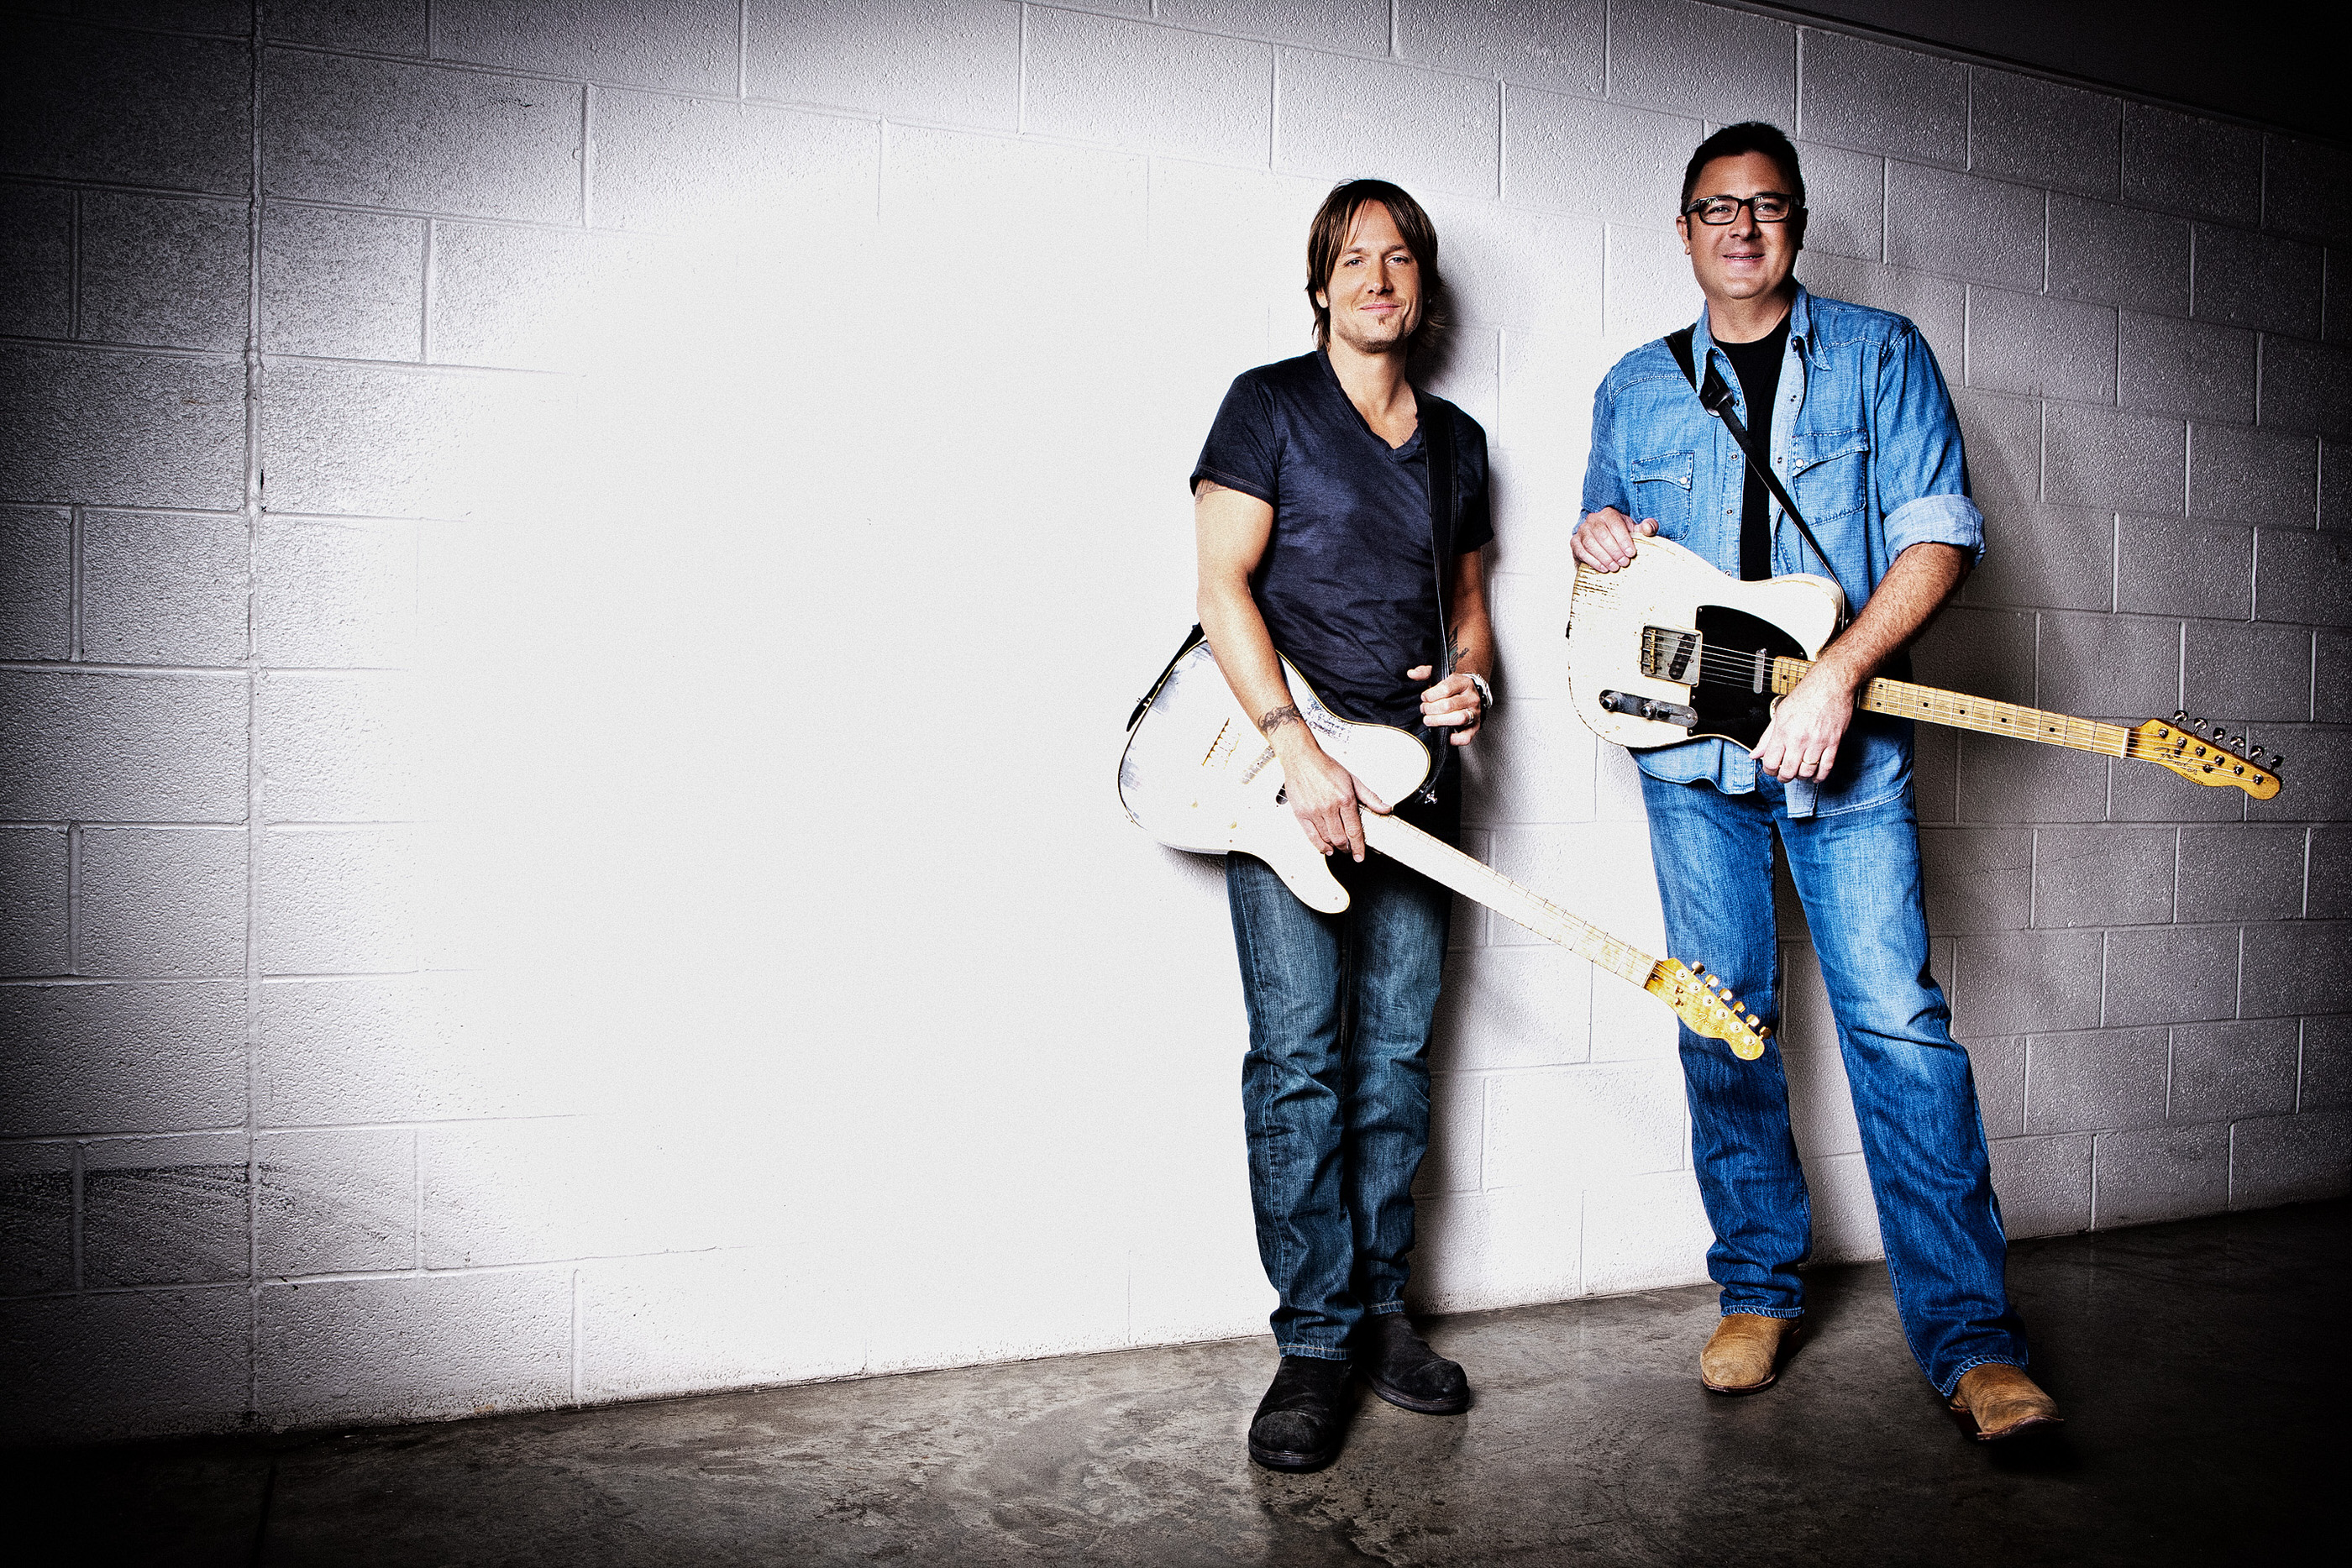 Keith Urban & Vince Gill